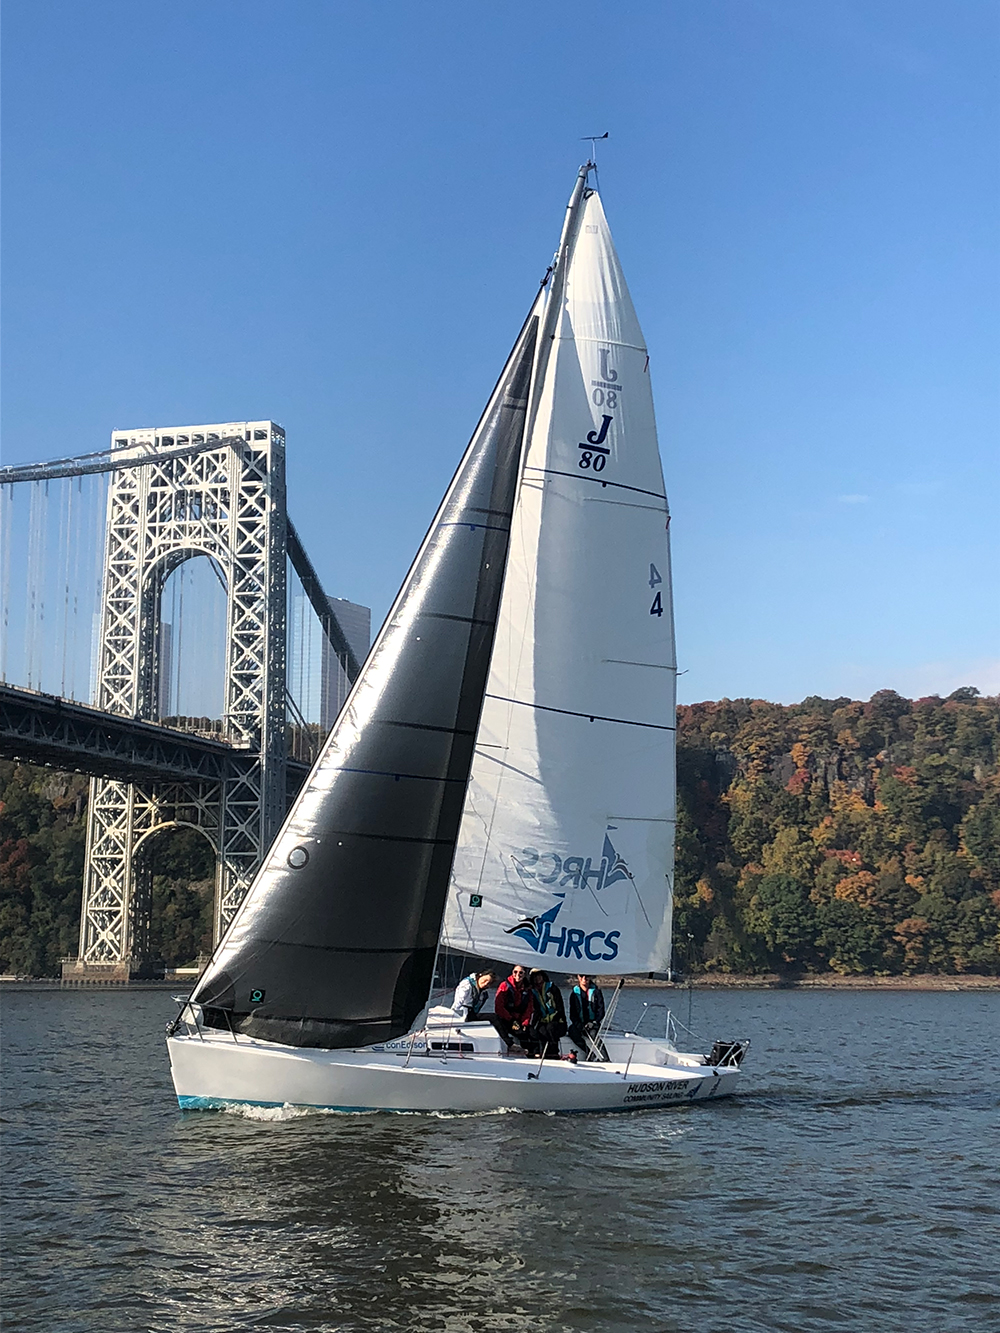 Students sailing on the Hudson River. Photo credit: Hudson River Community Sailing